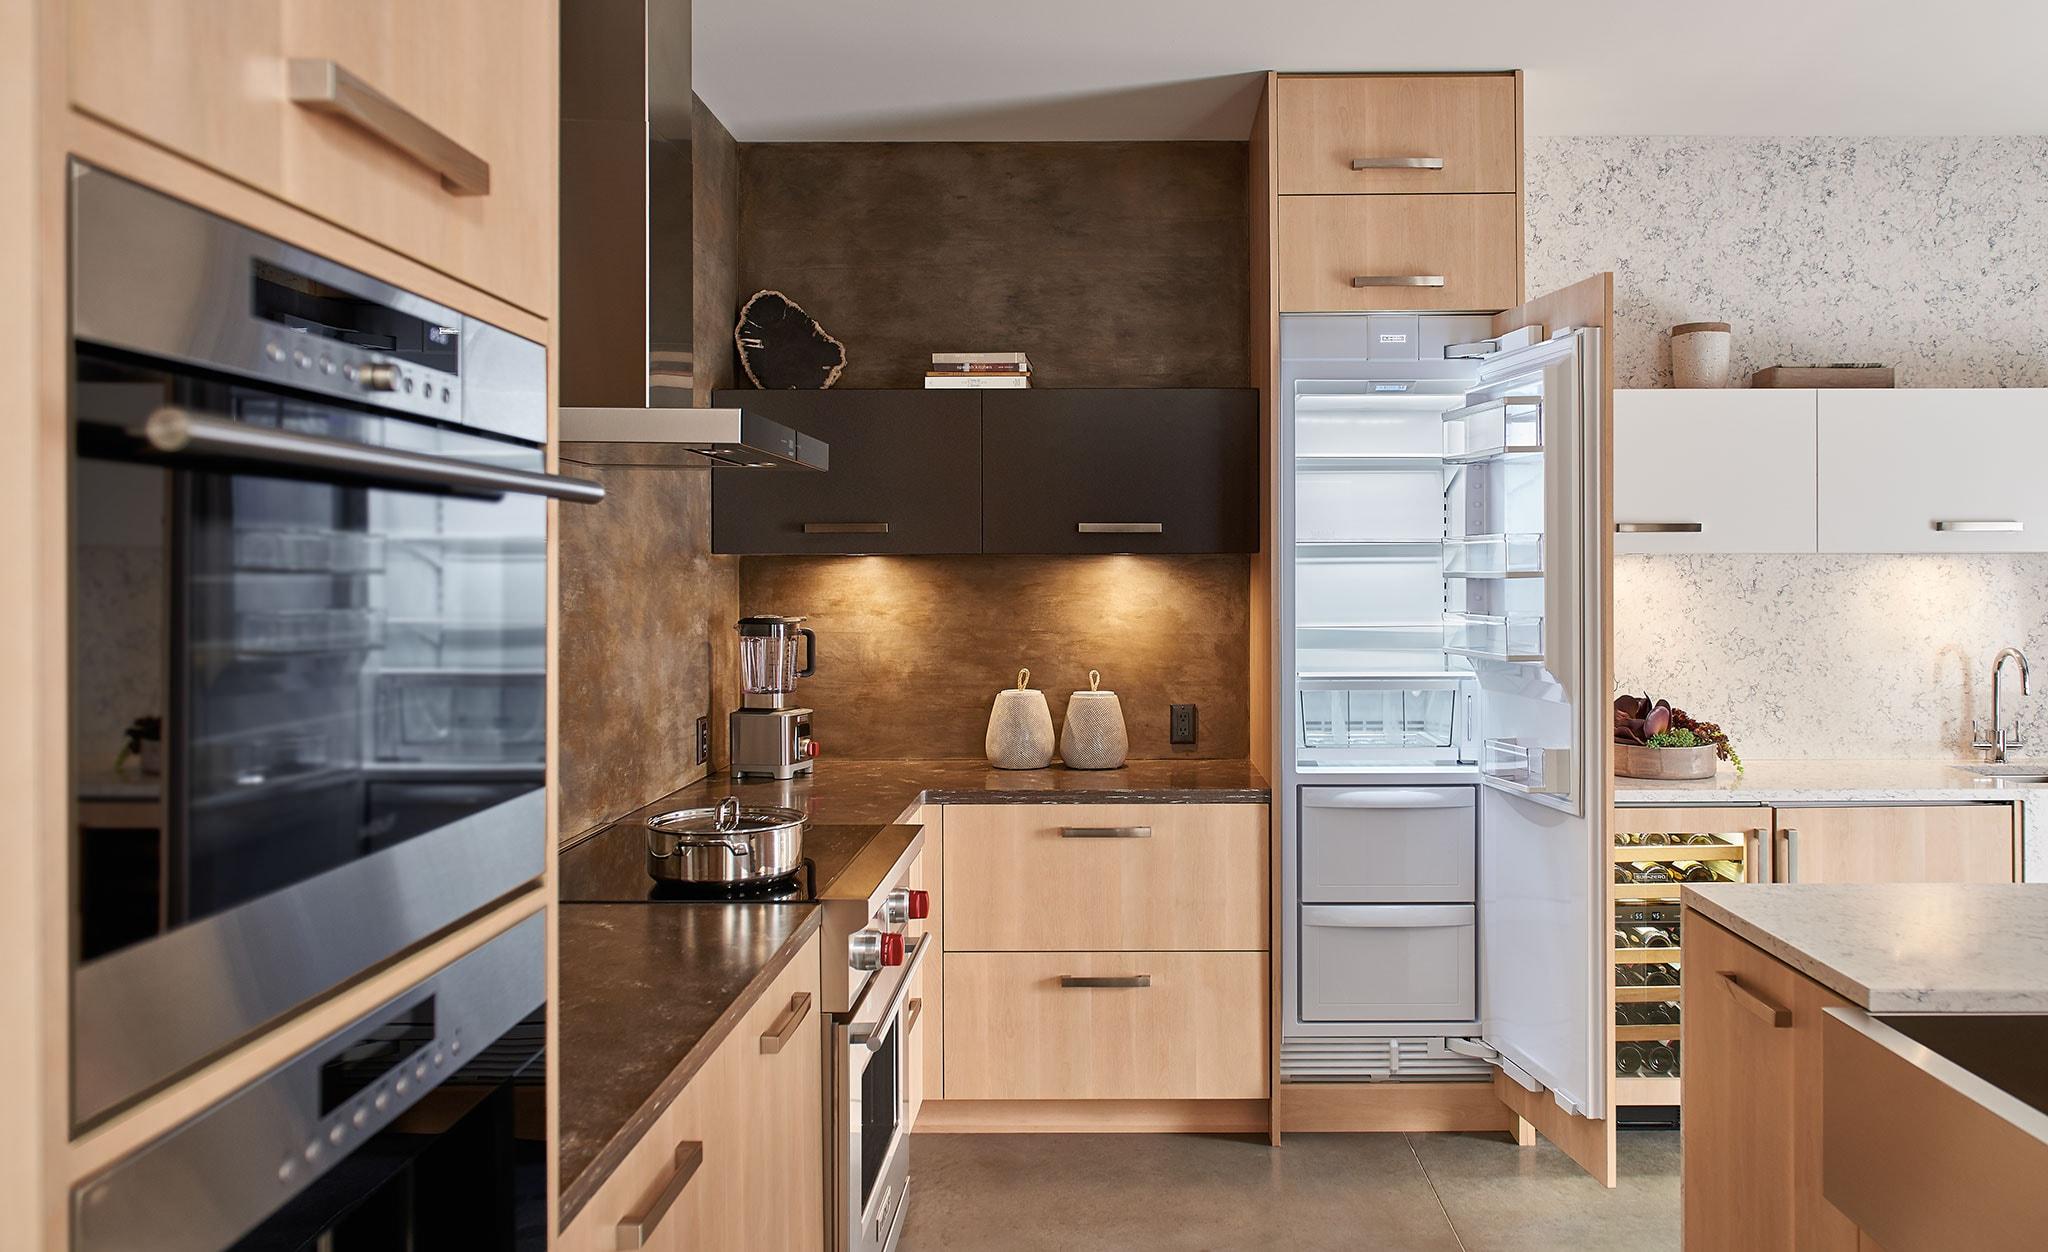 Sub Zero 24 Designer Column Refrigerator Freezer With Ice Maker